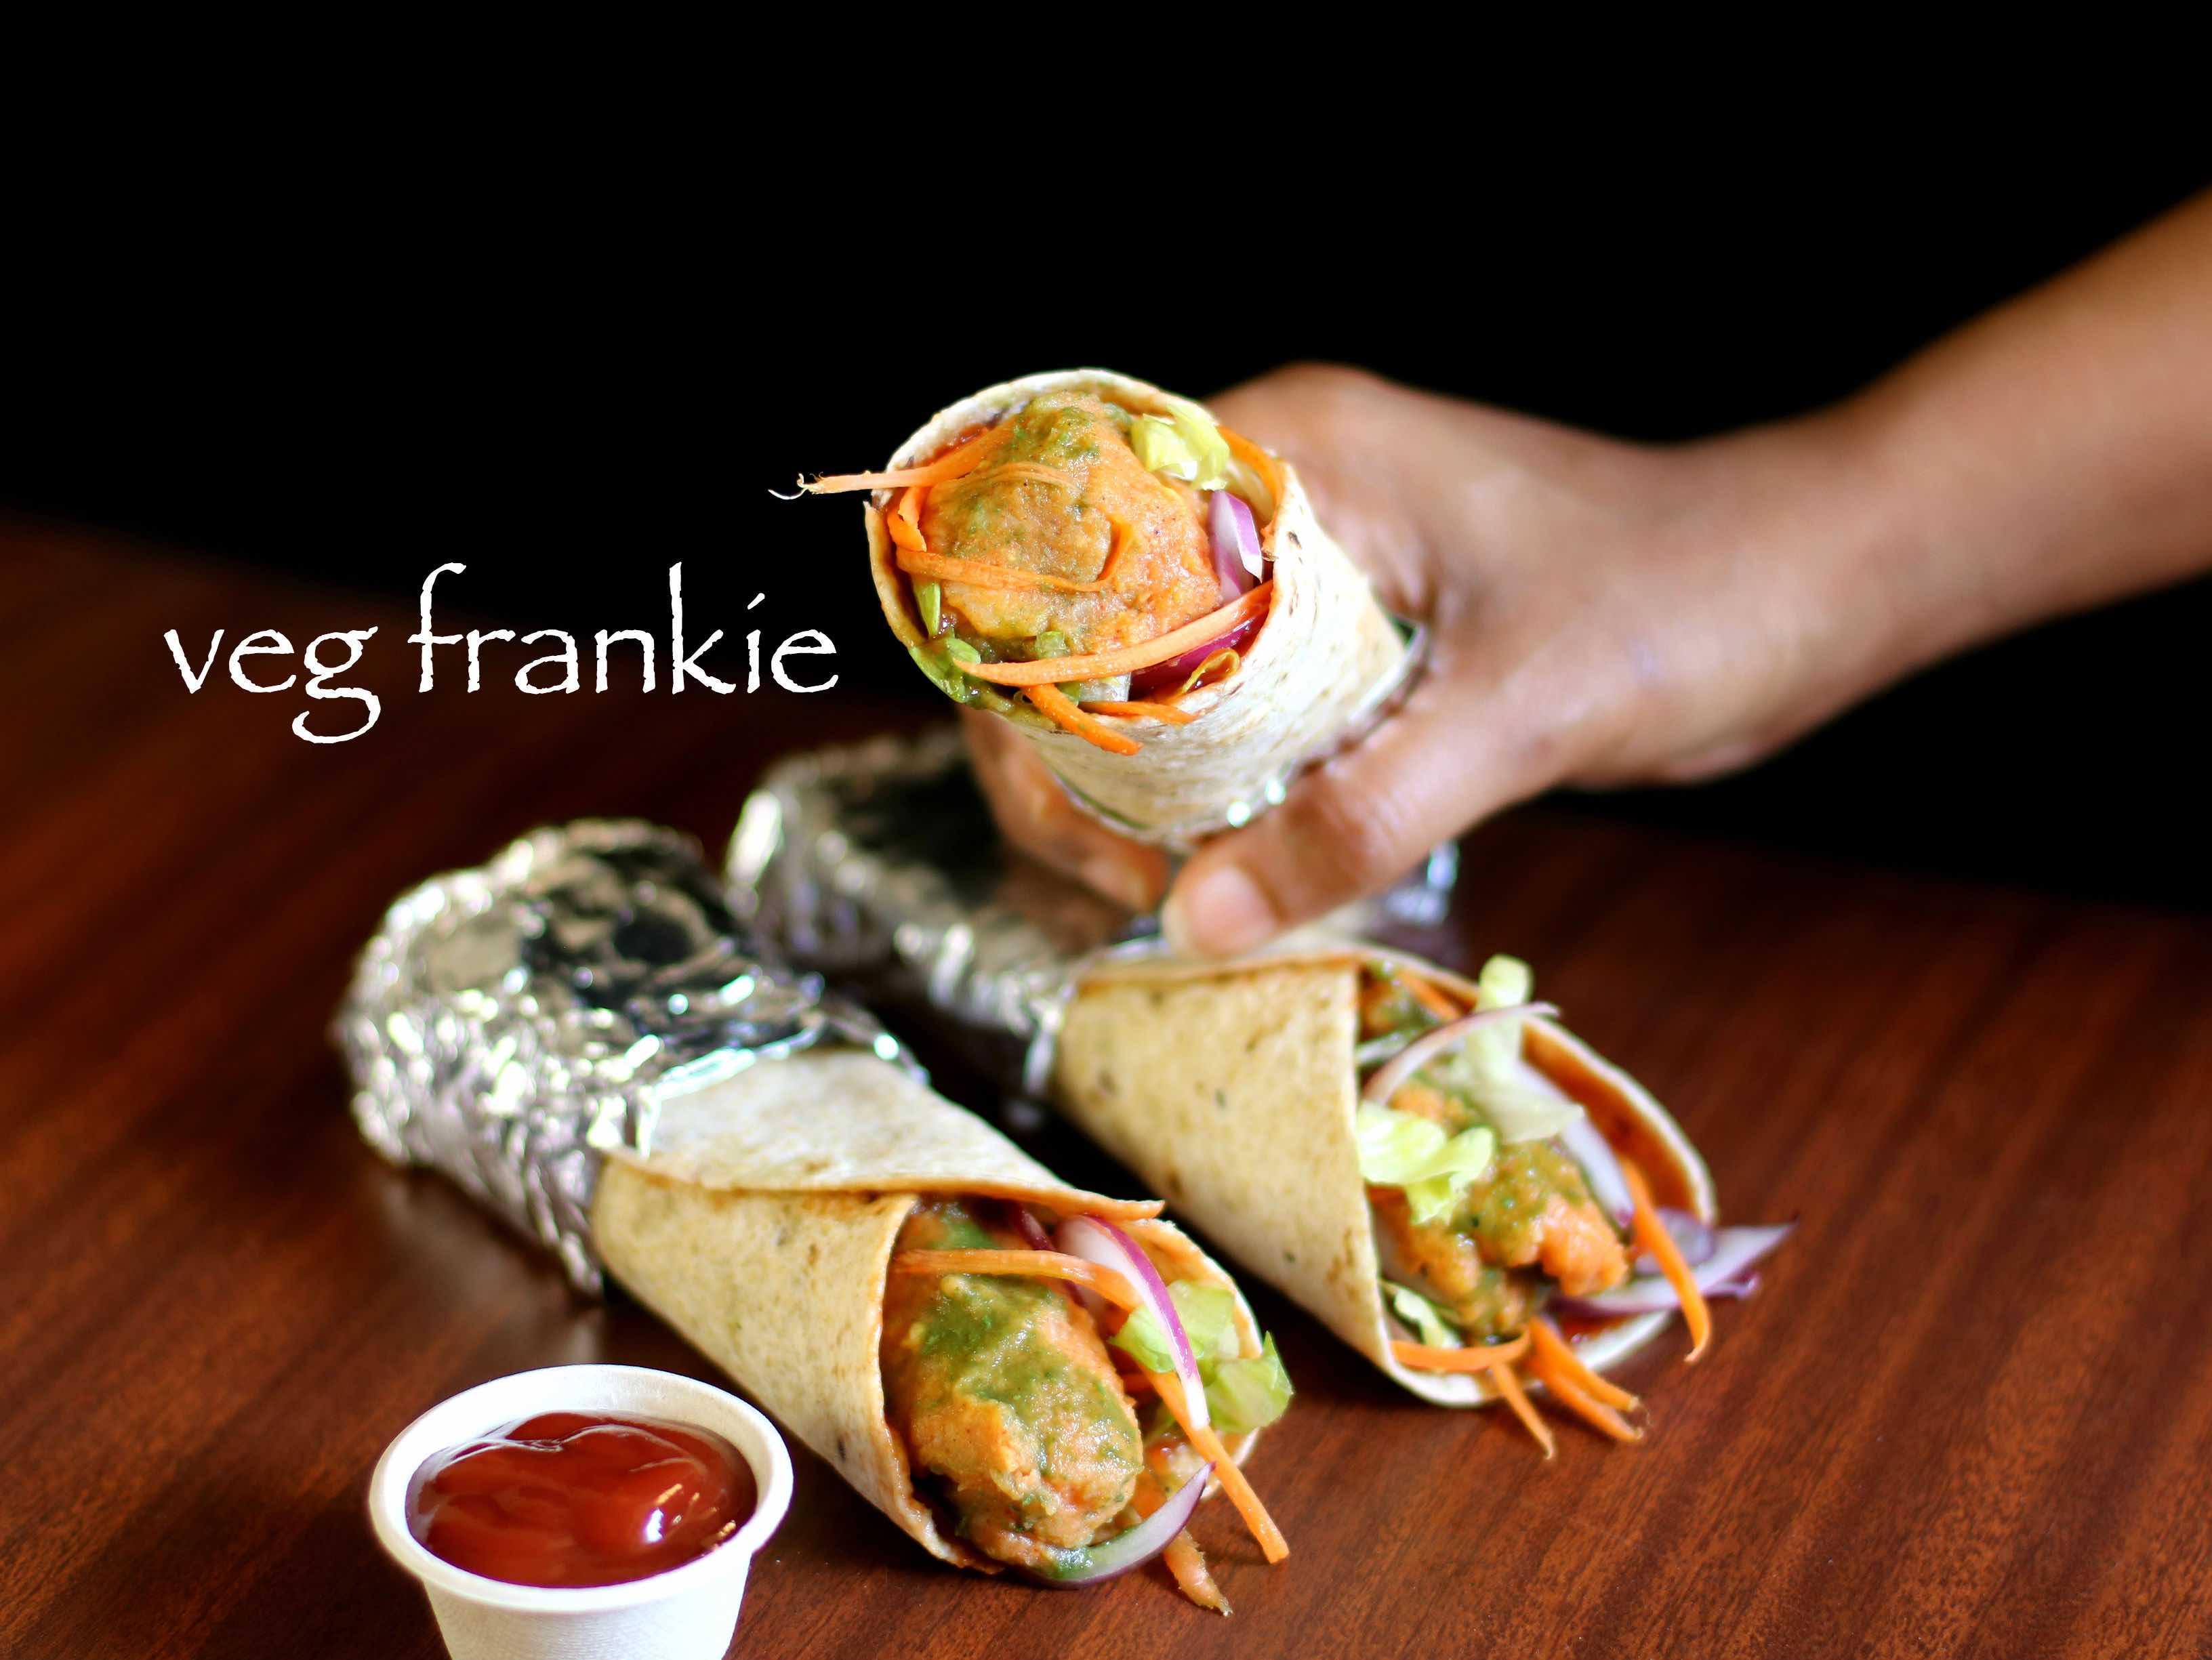 Fetching Veg Frankie Recipe Veg Kathi Roll Recipe Veg Frankie Roll Recipe 2 How To Roll A Wrap Tortilla How To Roll A Hemp Wrap nice food How To Roll A Wrap